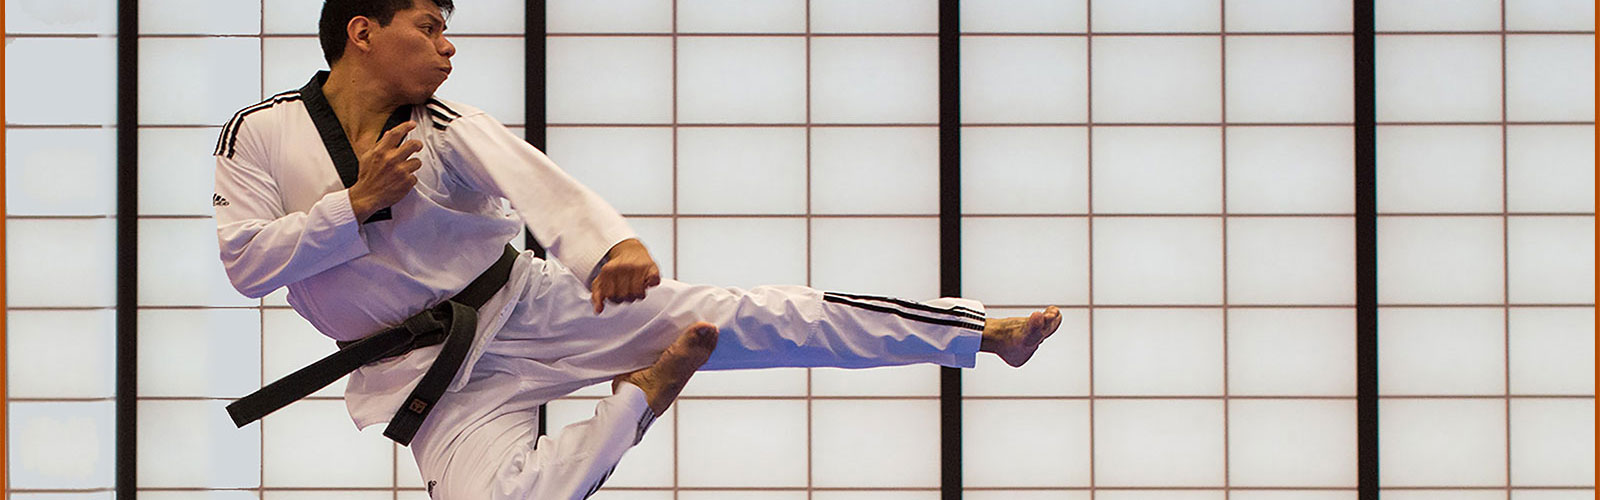 karate_proshop_guatemala_1